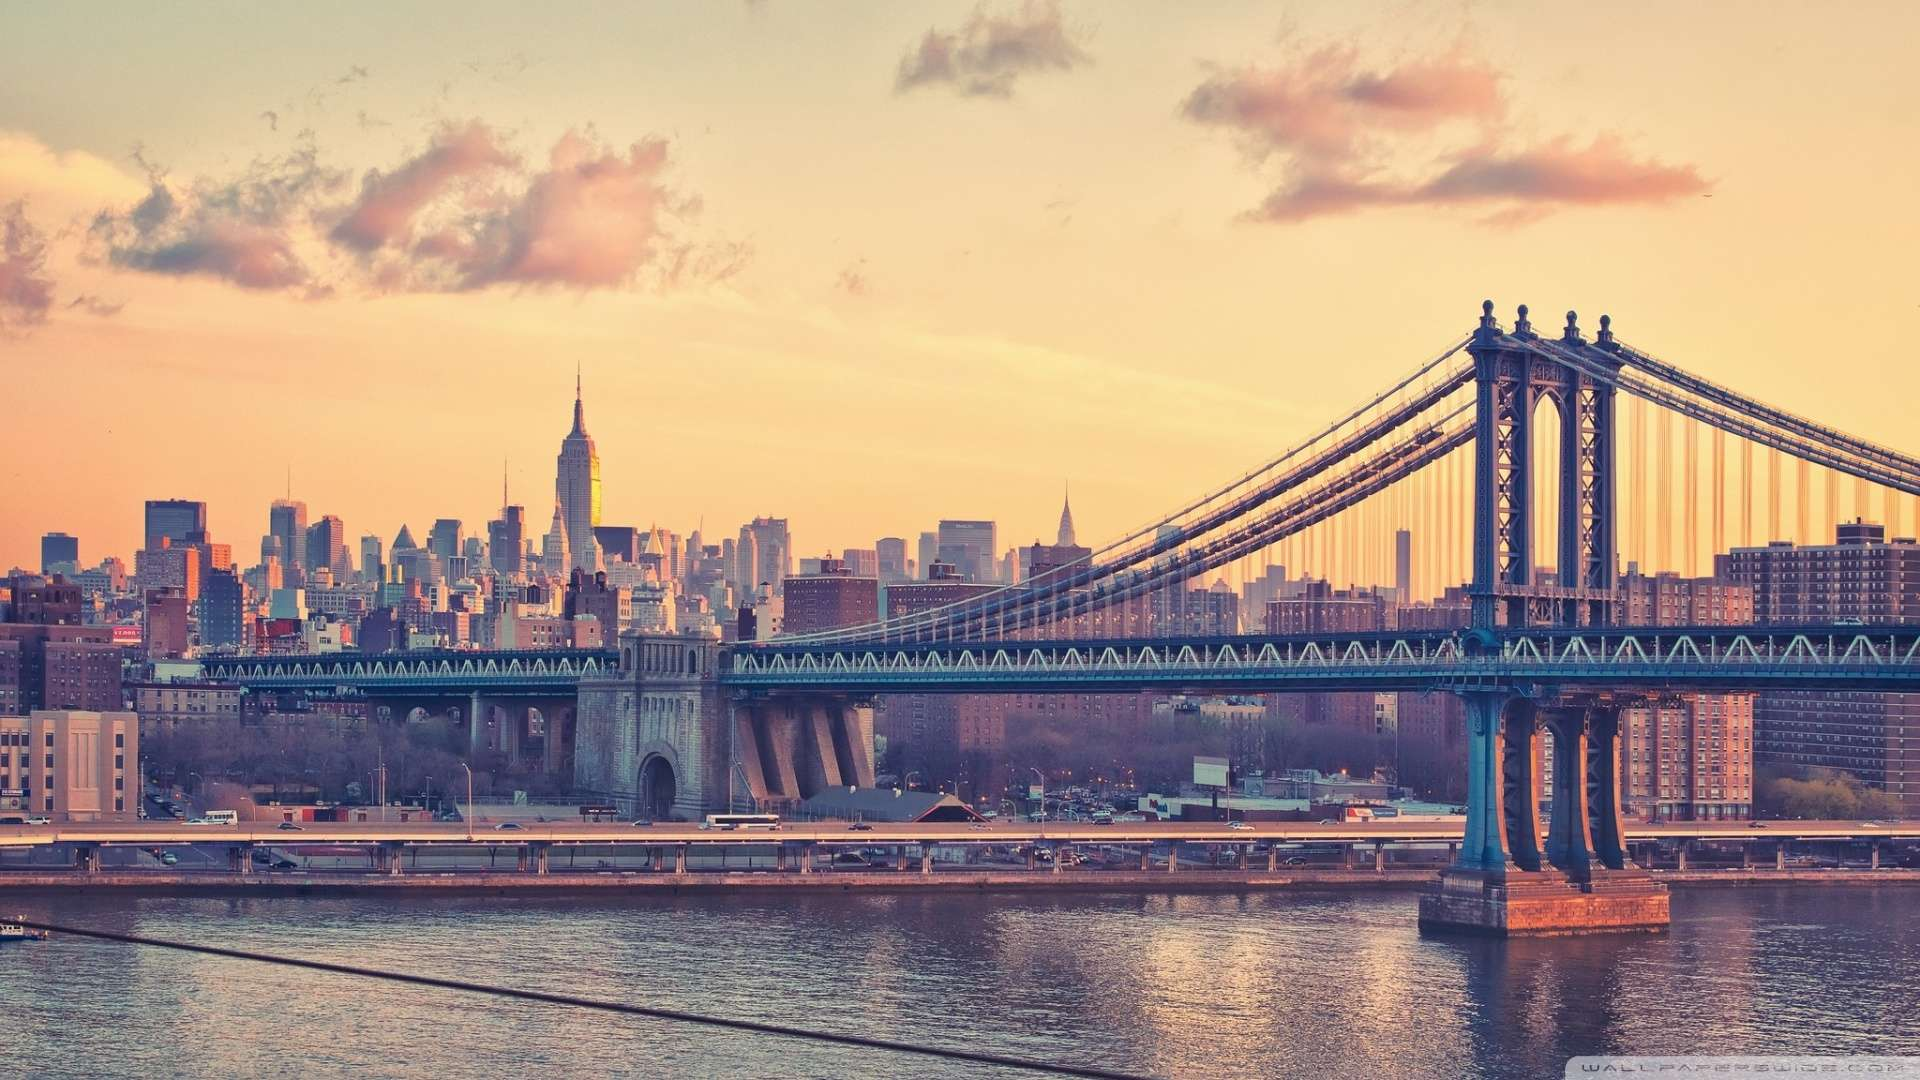 bay_bridge_new_york-wallpaper-1920x1080